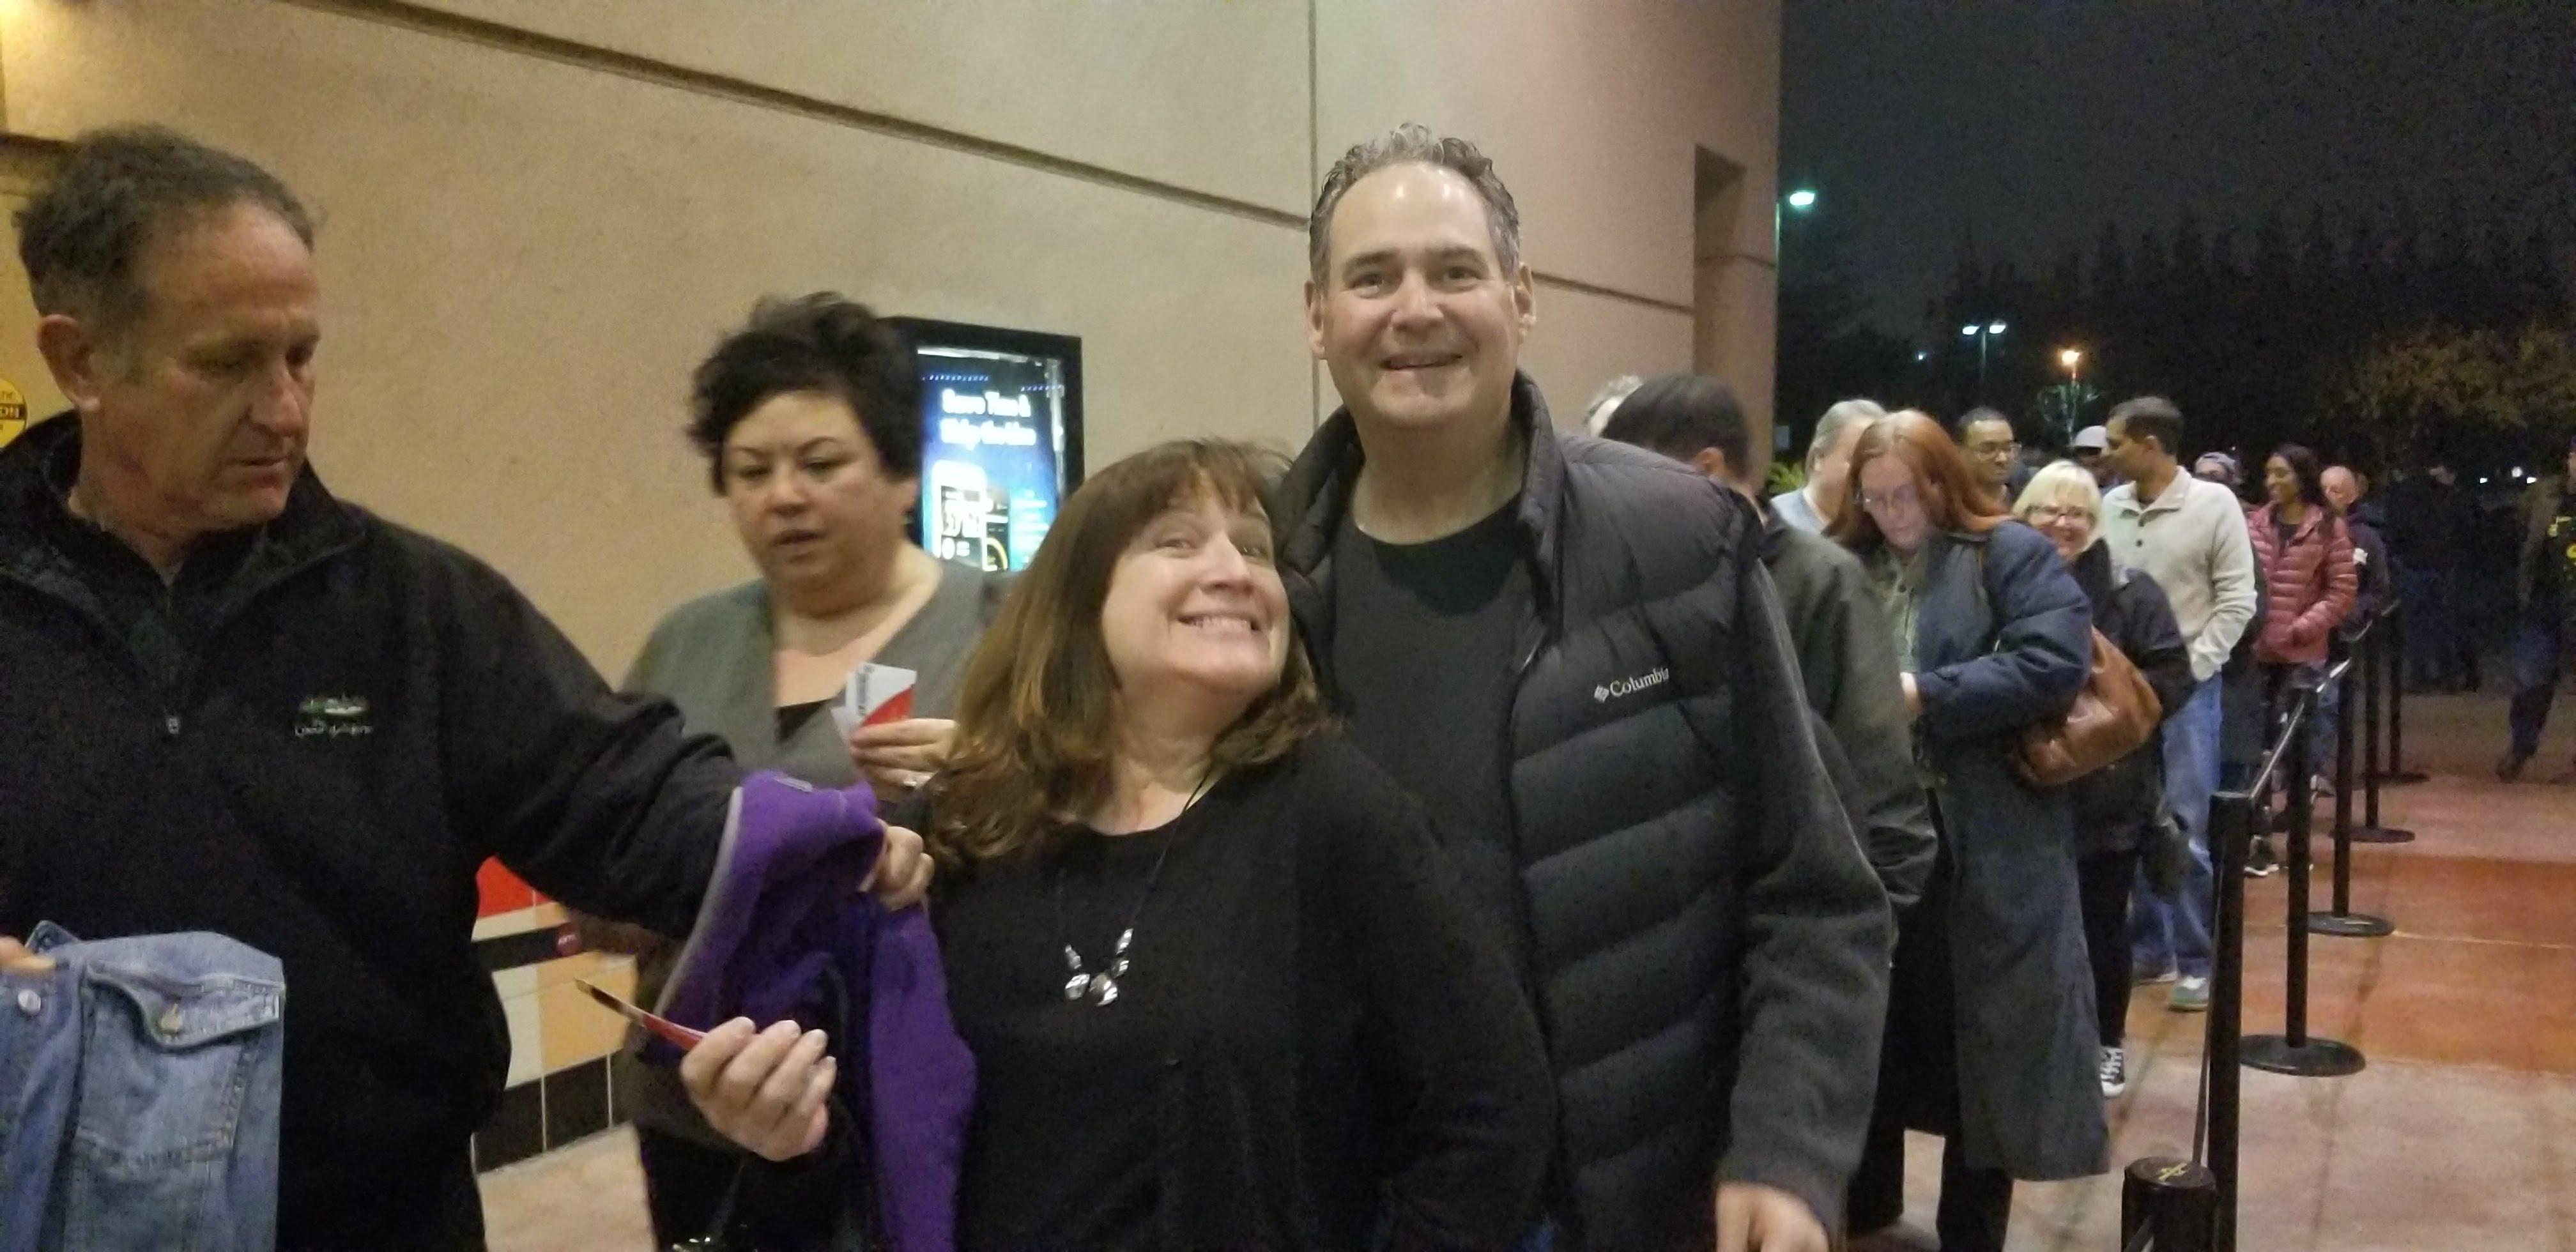 Jeanne Rosenberger with Dr. Steven Cohen